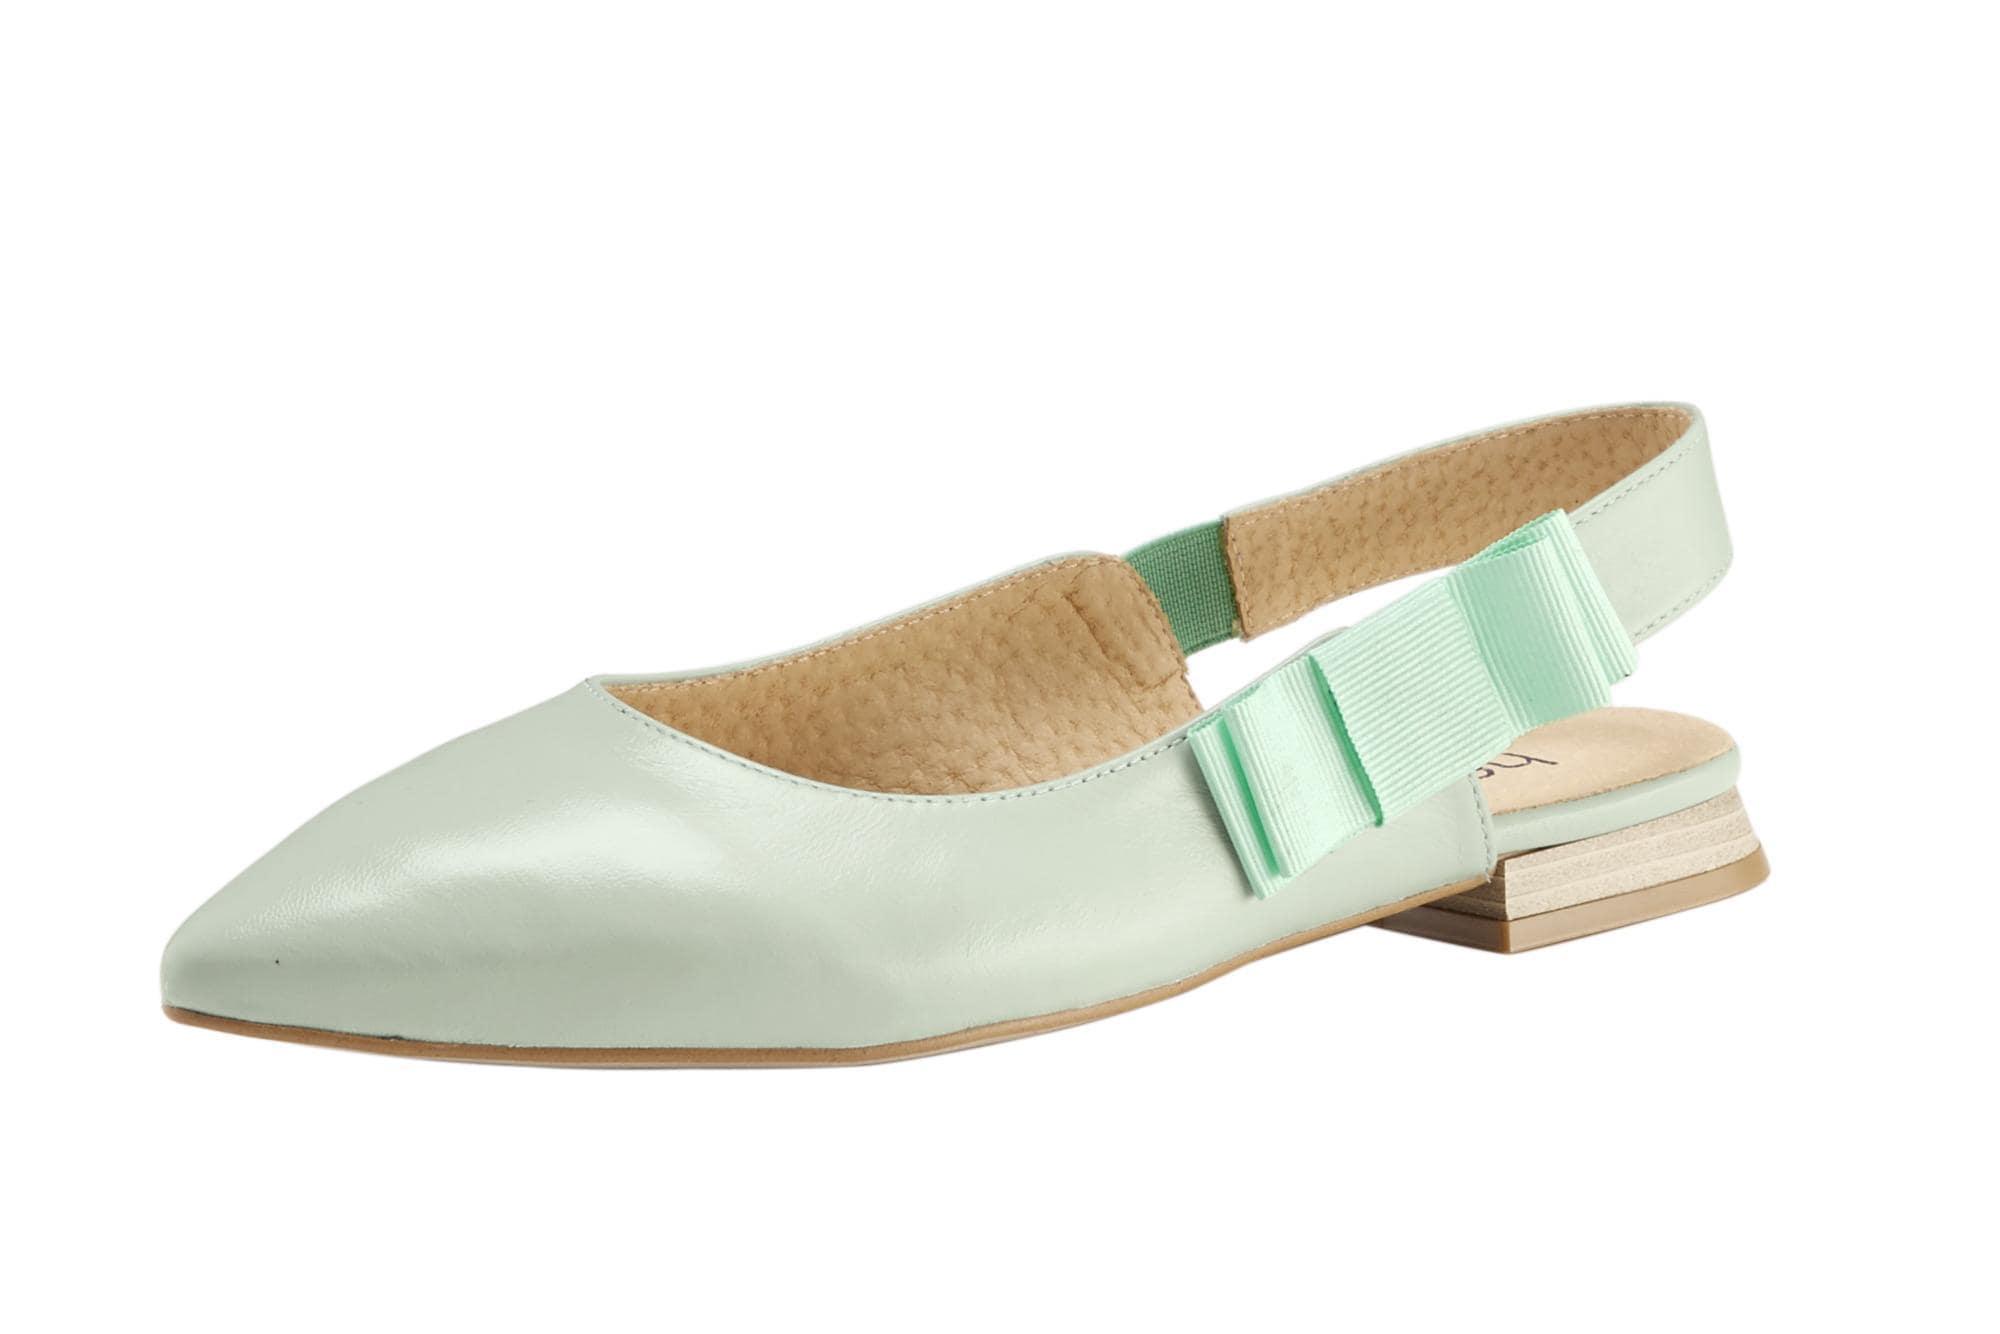 Slingballerina | Schuhe > Ballerinas | Mint | heine